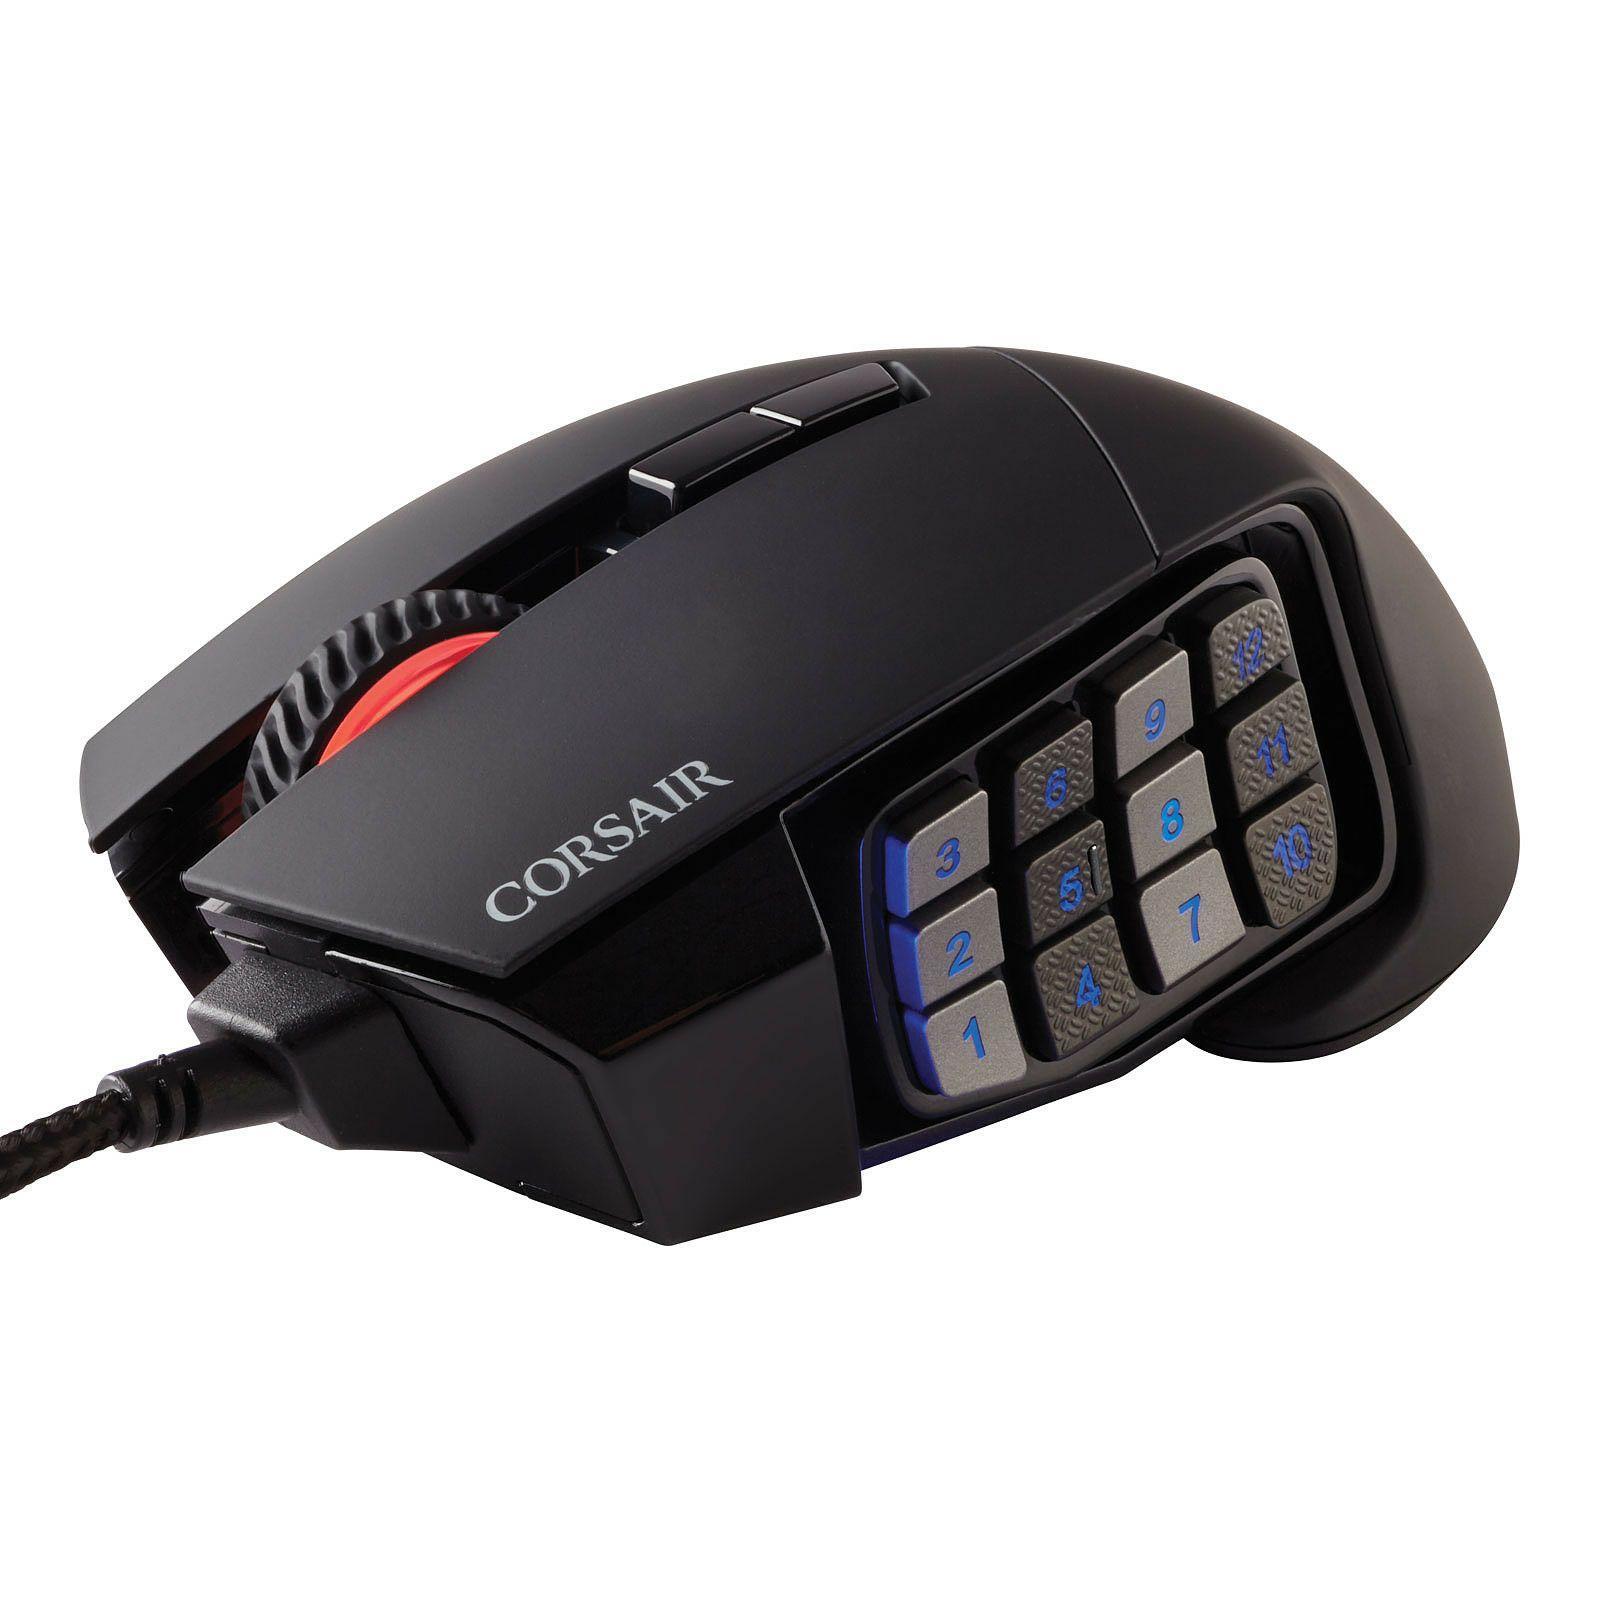 Ratón Gaming Corsair Scimitar Pro RGB